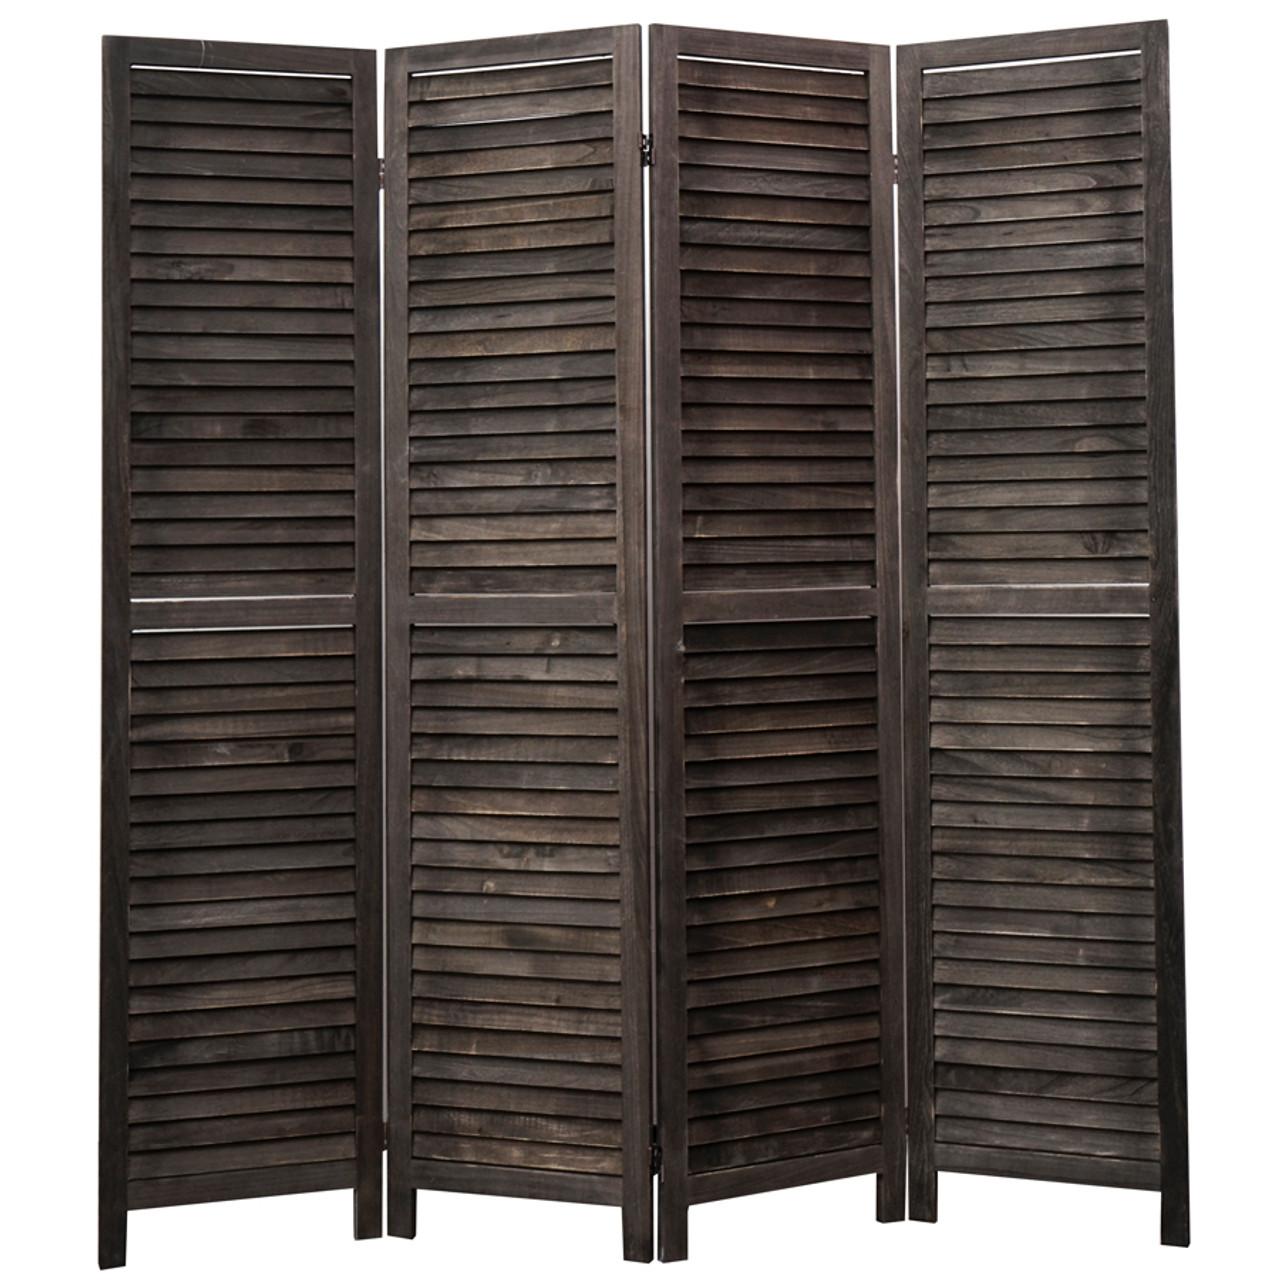 4, 6, 8 Panel Room Divider Full Length Wood Shutters Black in USA, California, New York, New York City, Los Angeles, San Francisco, Pennsylvania, Washington DC, Virginia, Maryland